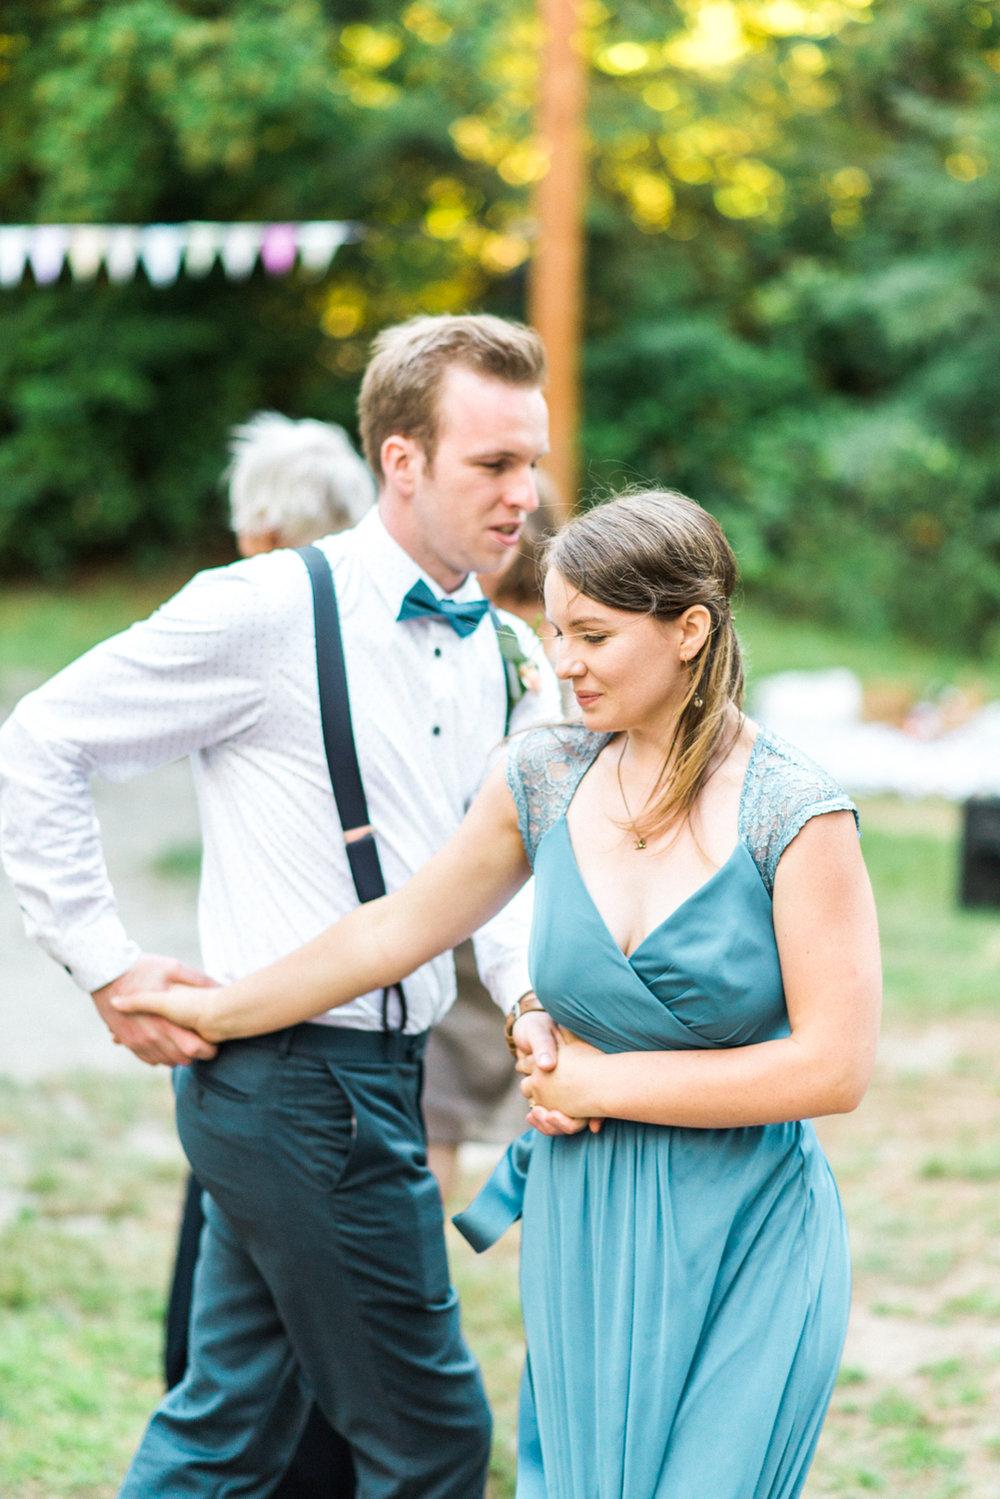 astoria-wedding-fort-stevens-oregon-kc-shelley-marie-photo-1248.jpg